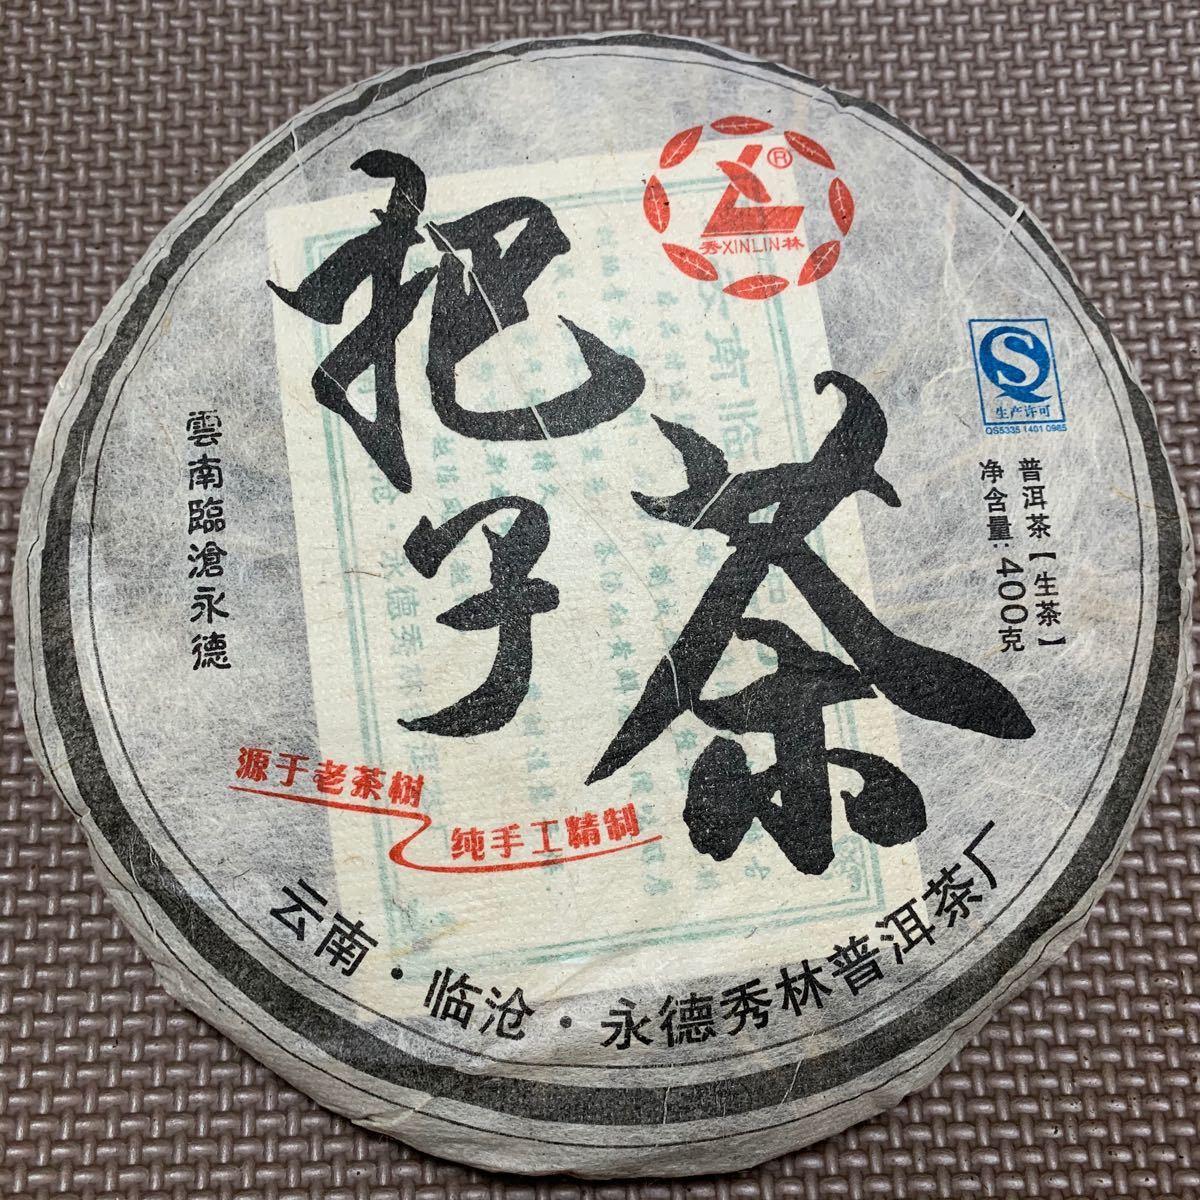 秀林 杷子茶 生茶 プーアル茶 2014